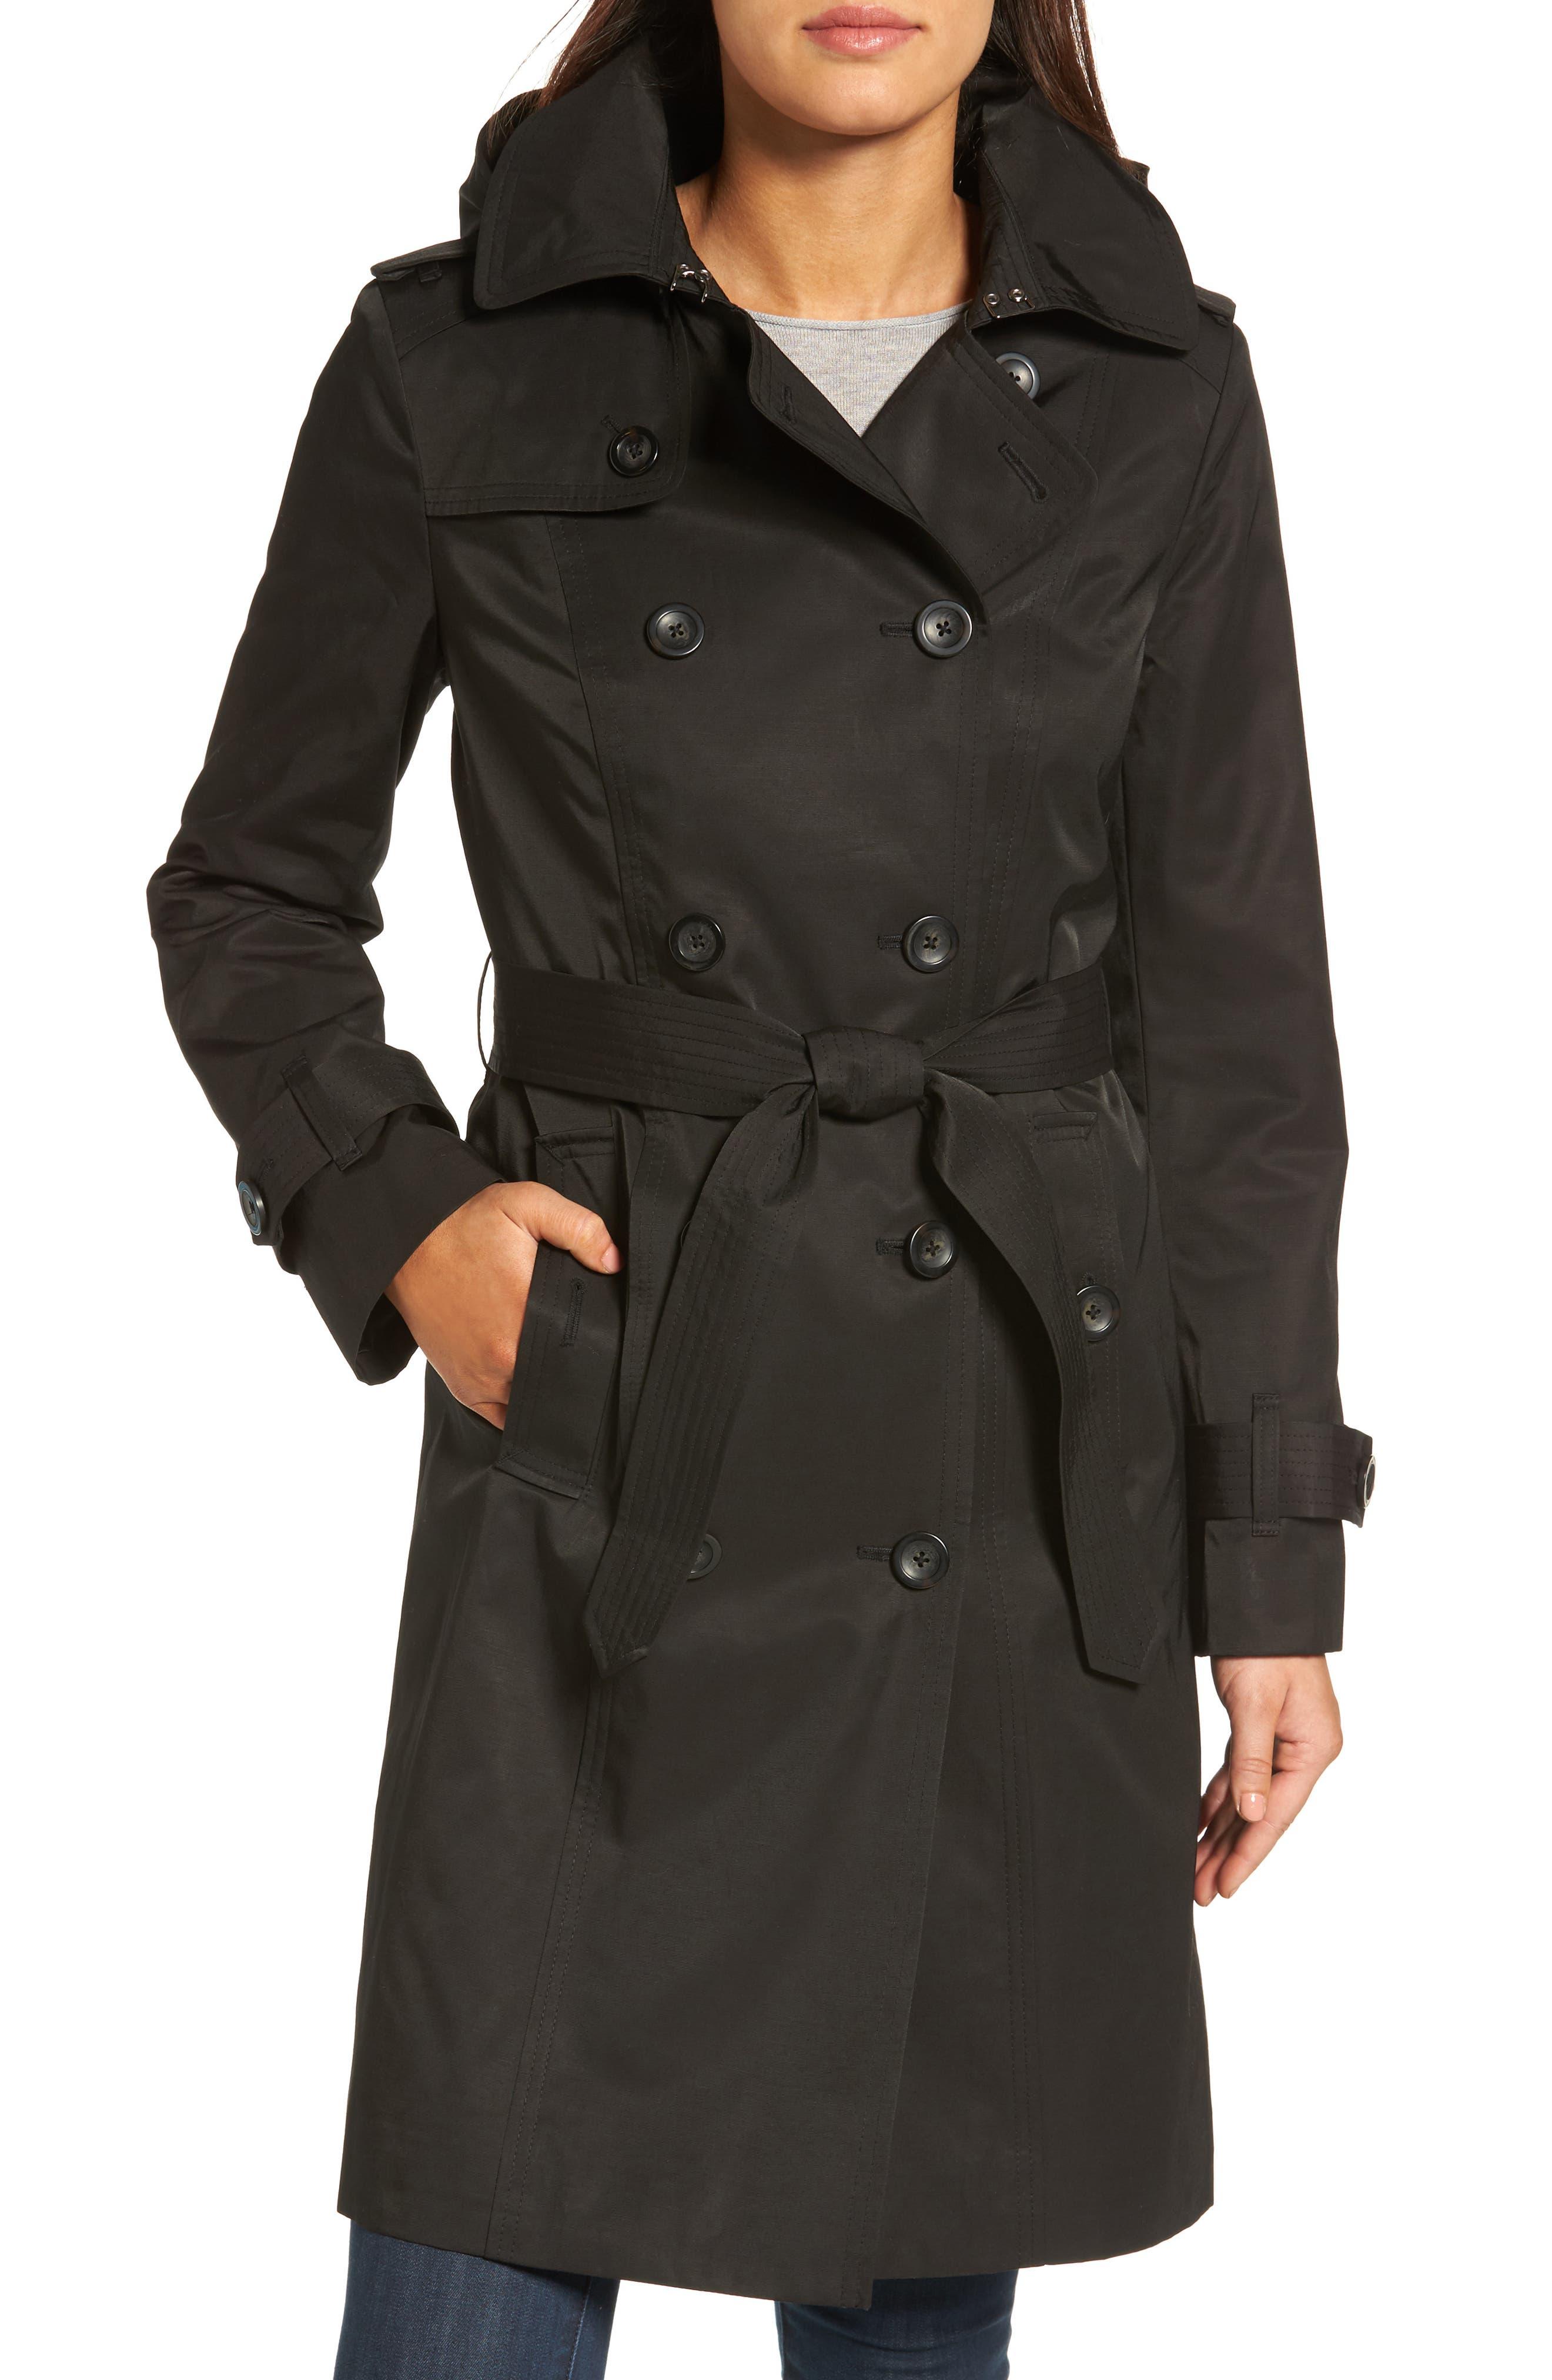 Online shopping coats jackets